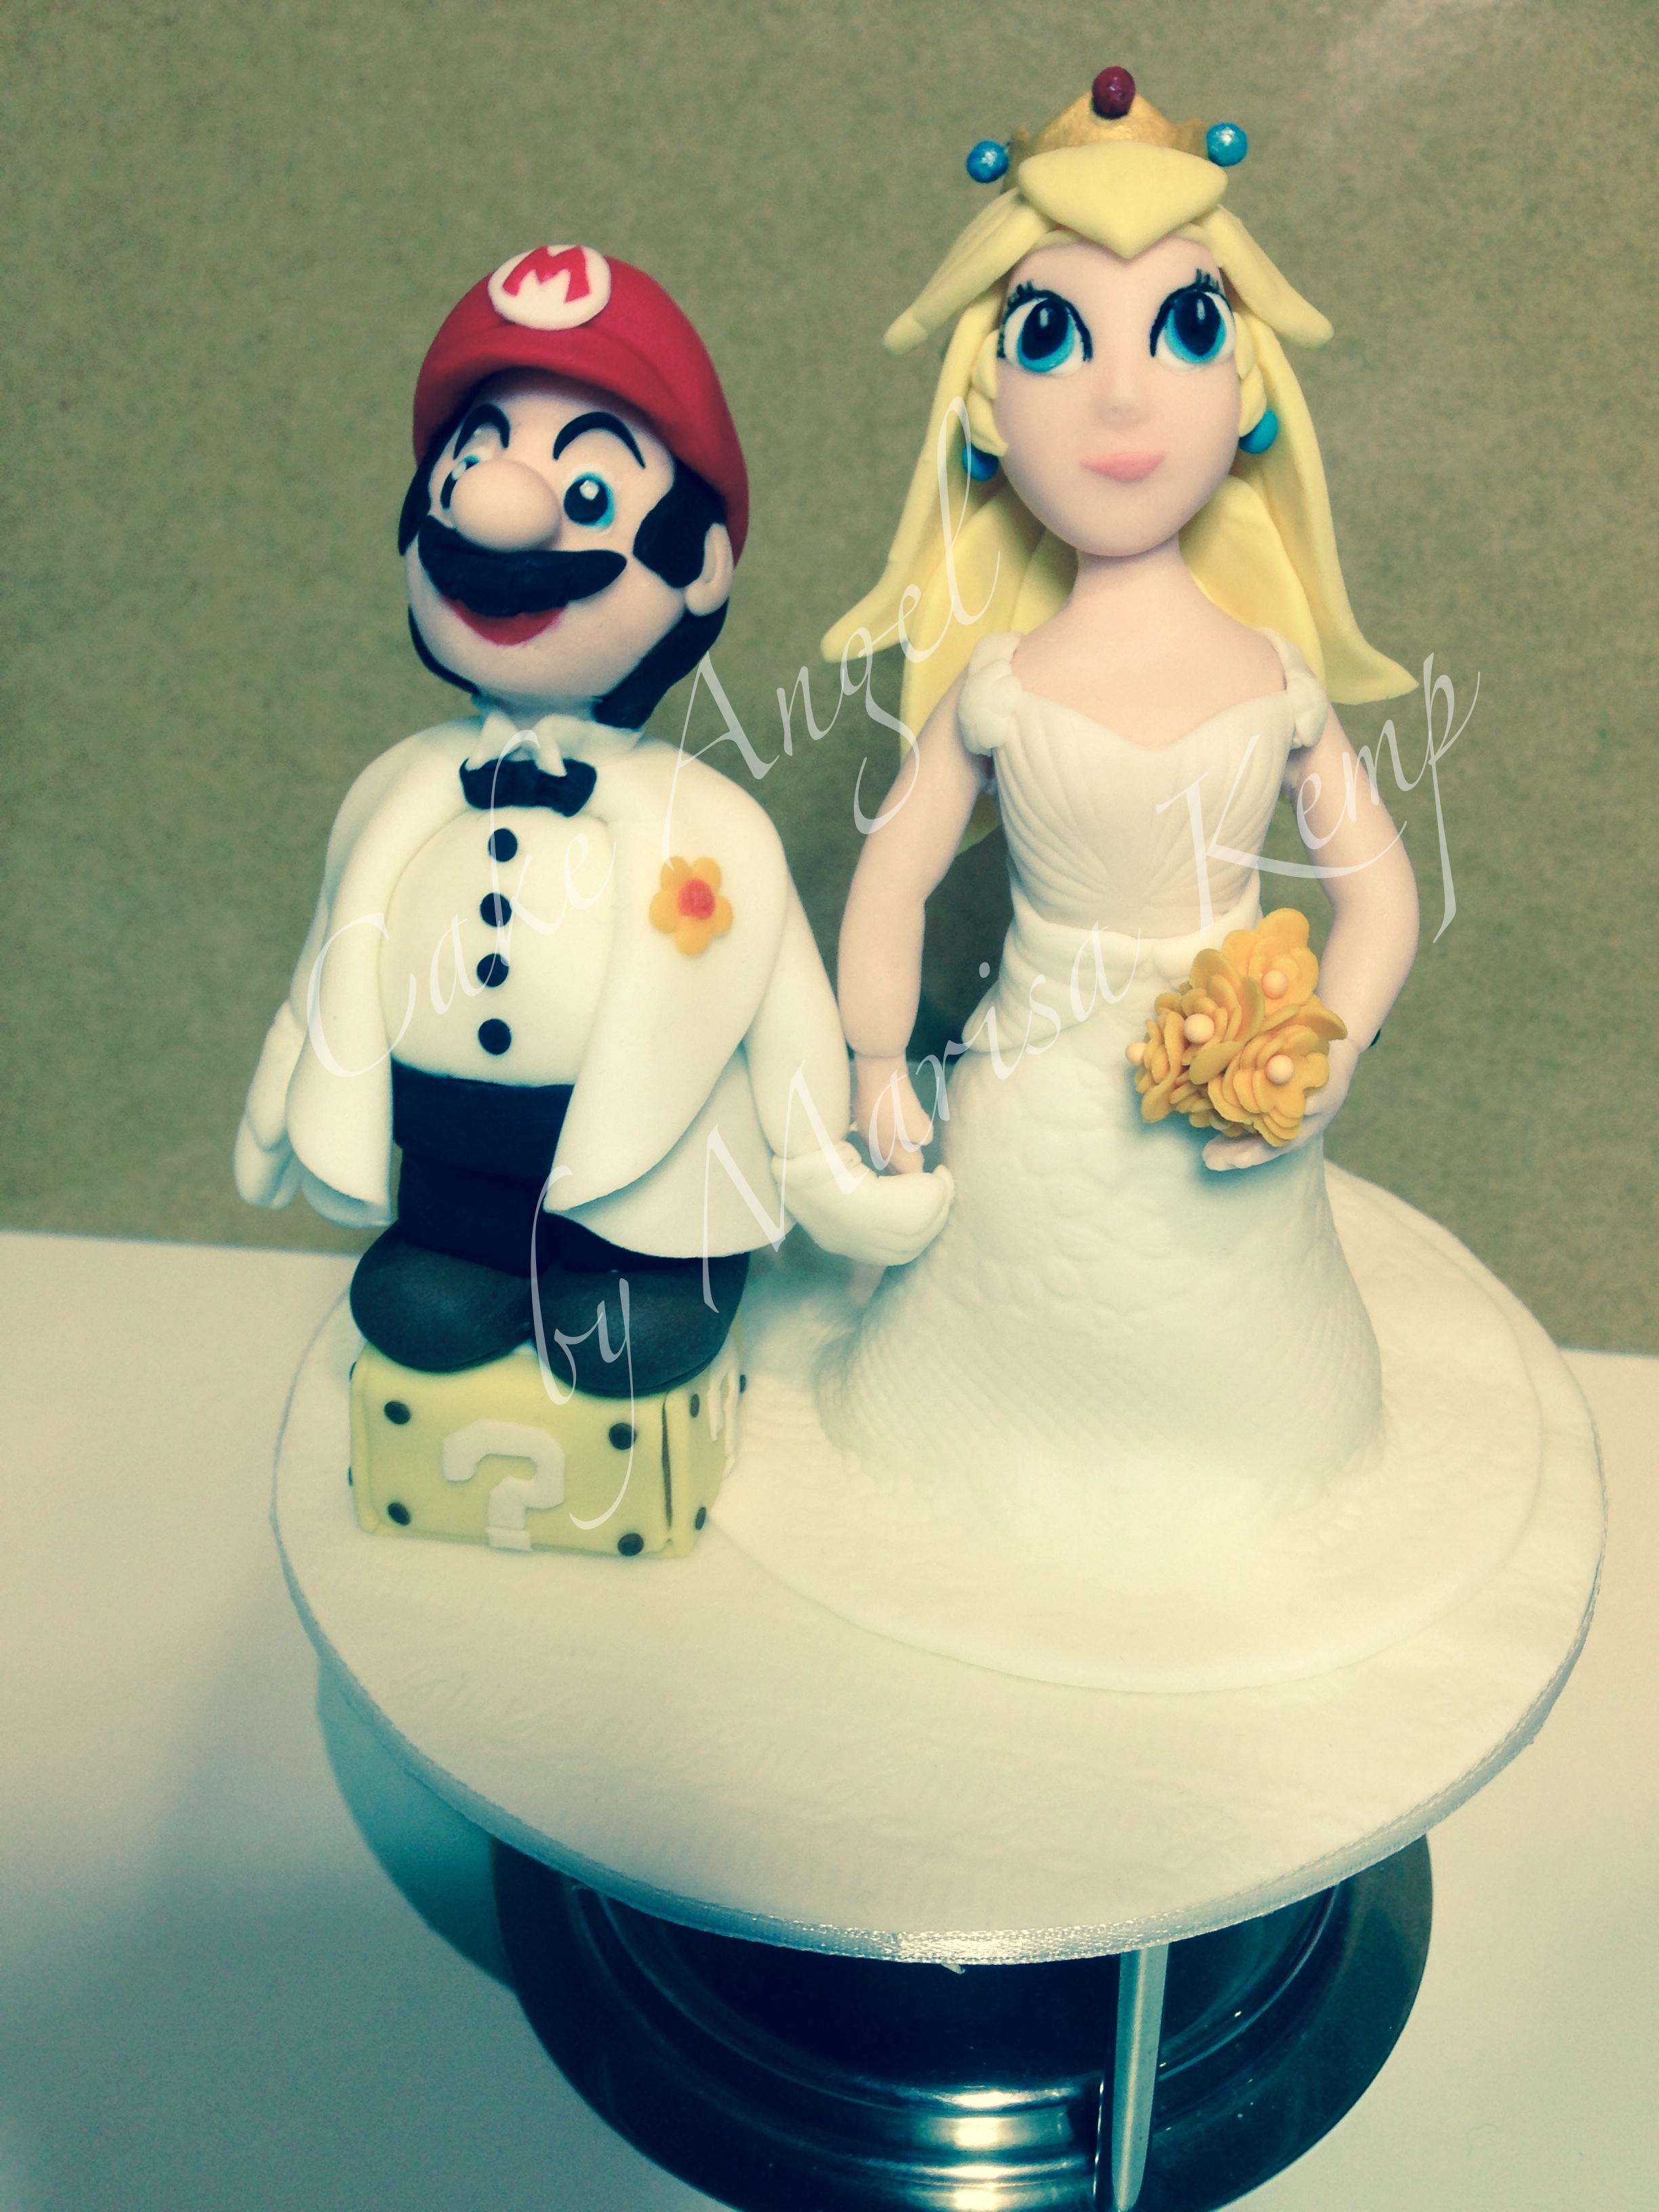 Super Mario and Princess Peach Topper